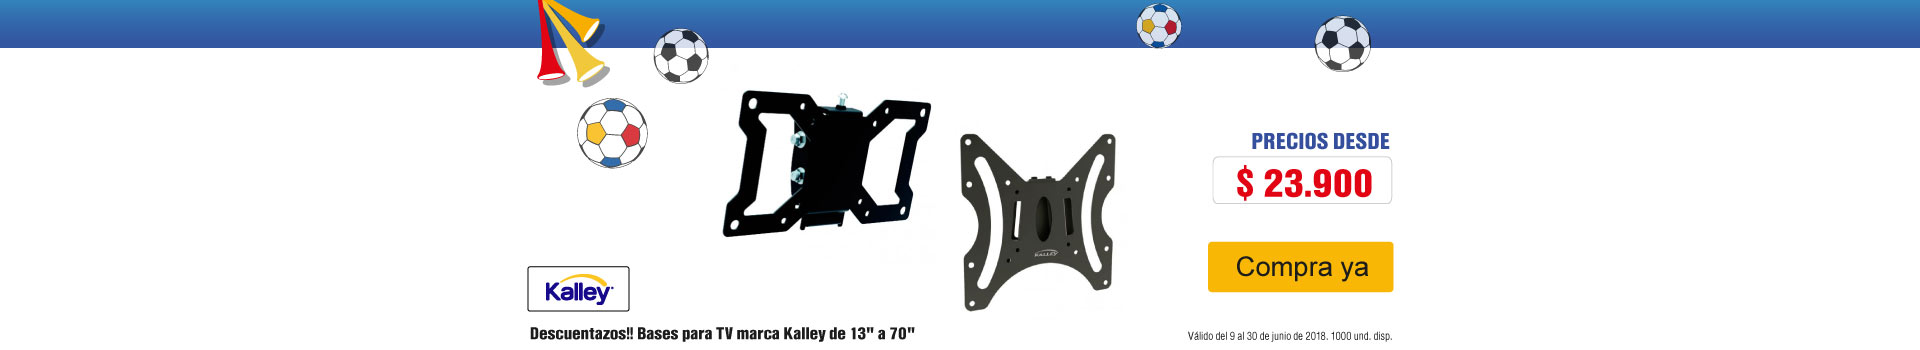 AK-KT-BCAT-6-accesorios-PP---Kalley-bases-Jun13